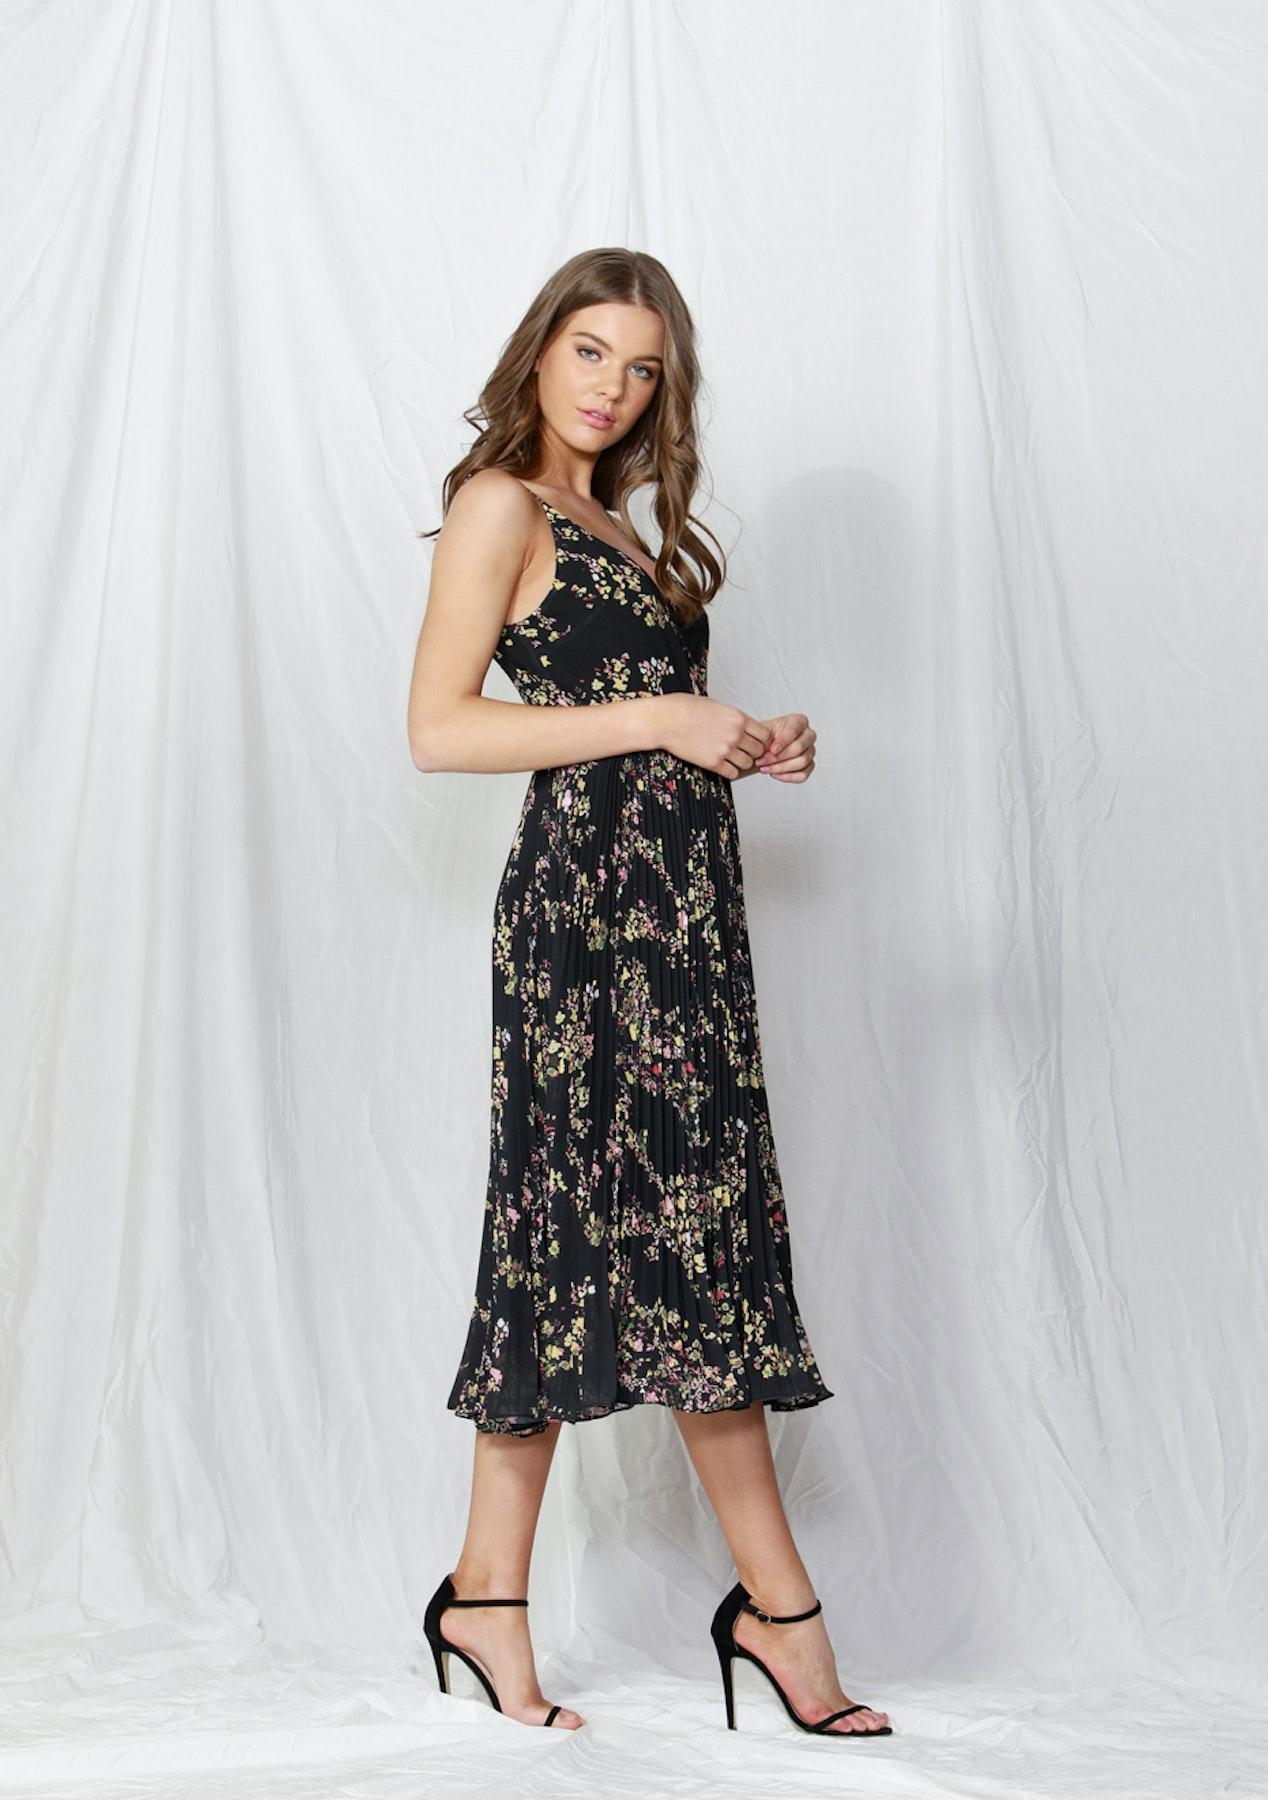 3c74cee82fd5a Fate - Lille Pleated Wrap Dress - Dolce Vita Print